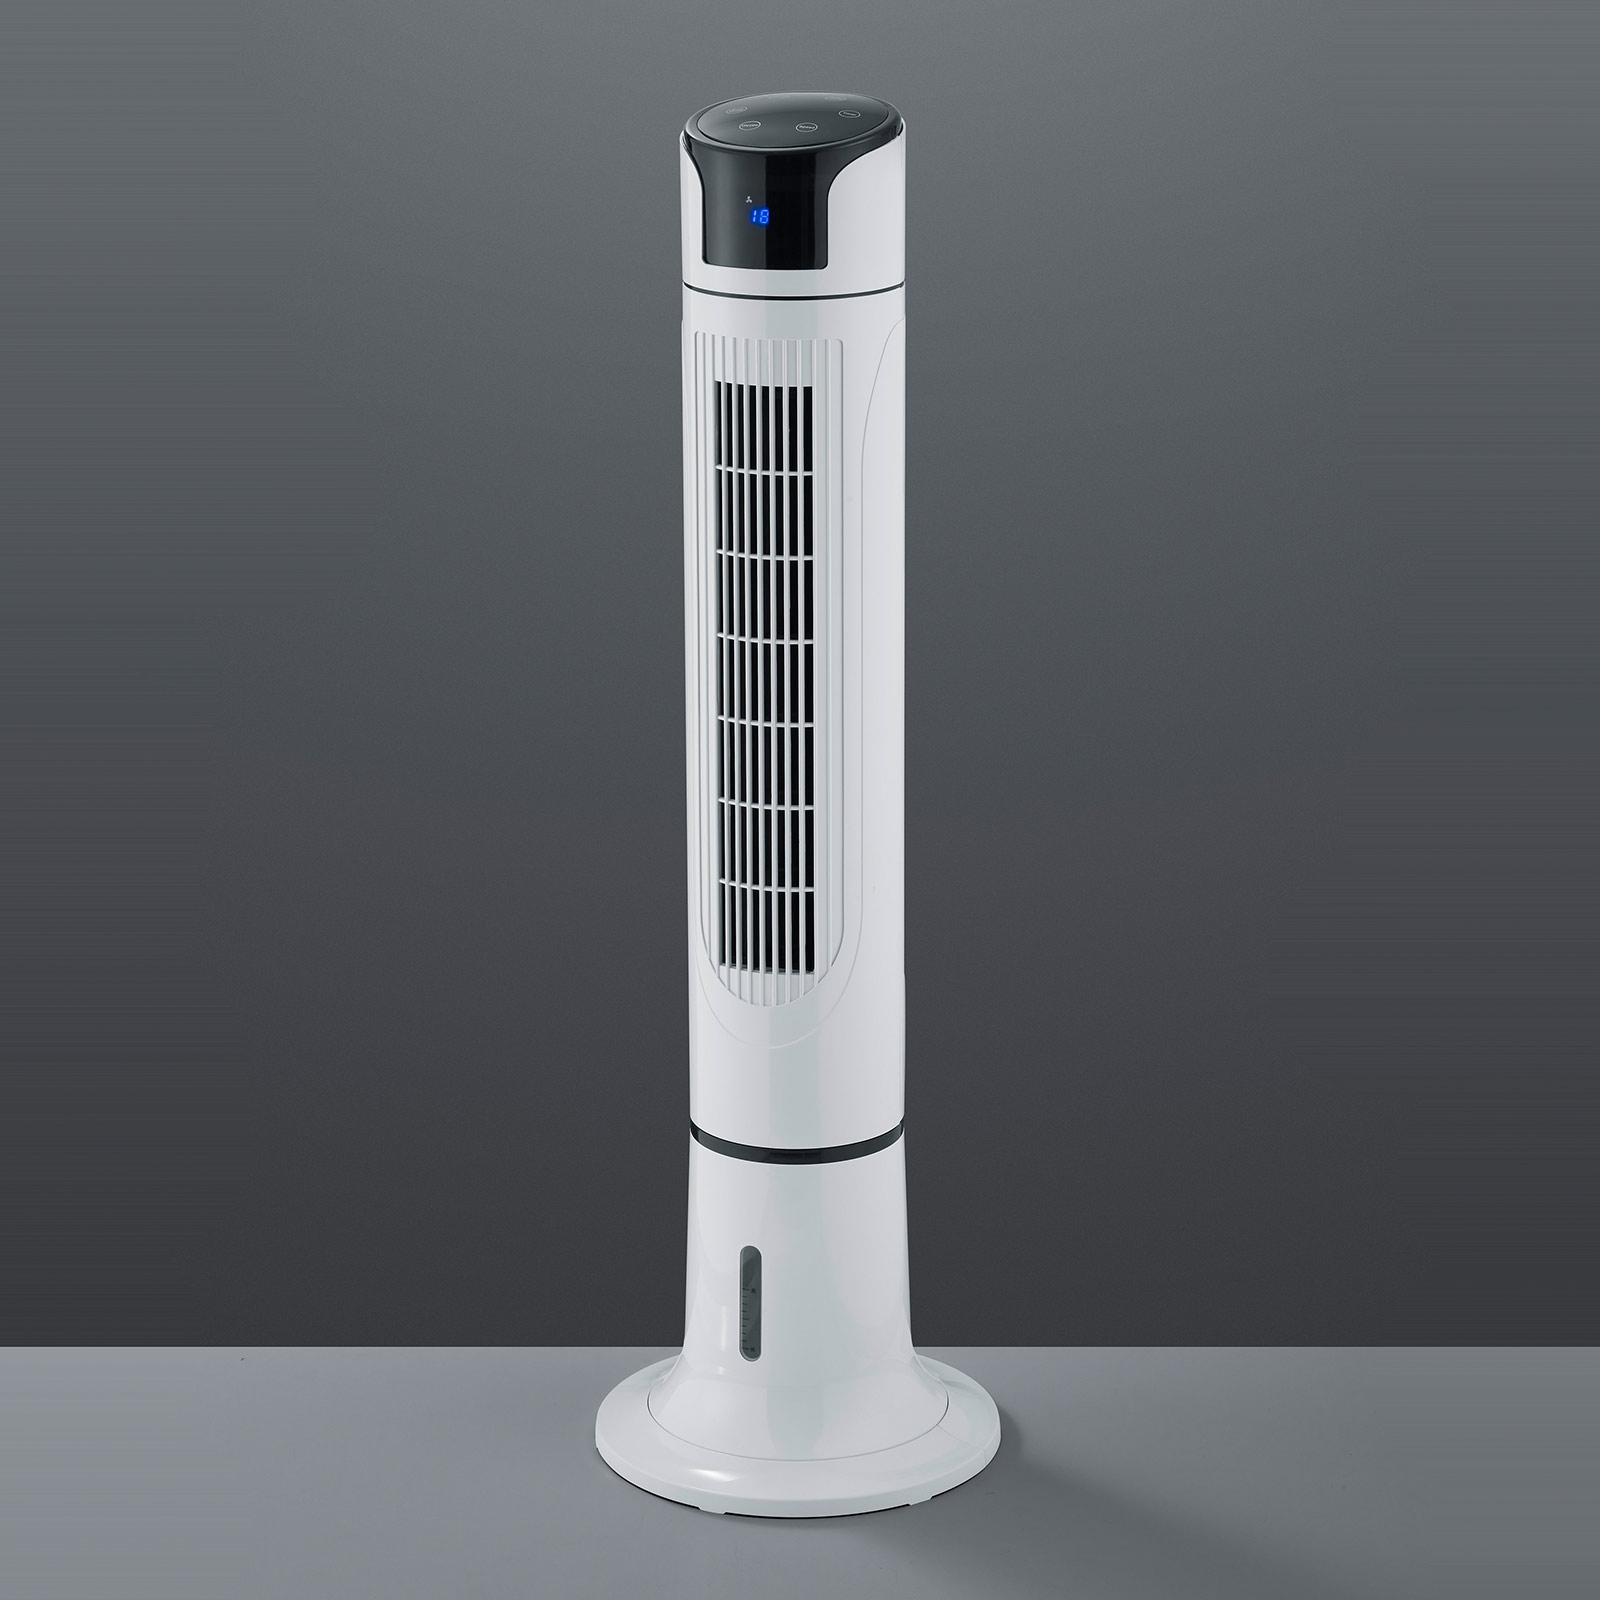 Standventilator Iceberg mit Touch-Display